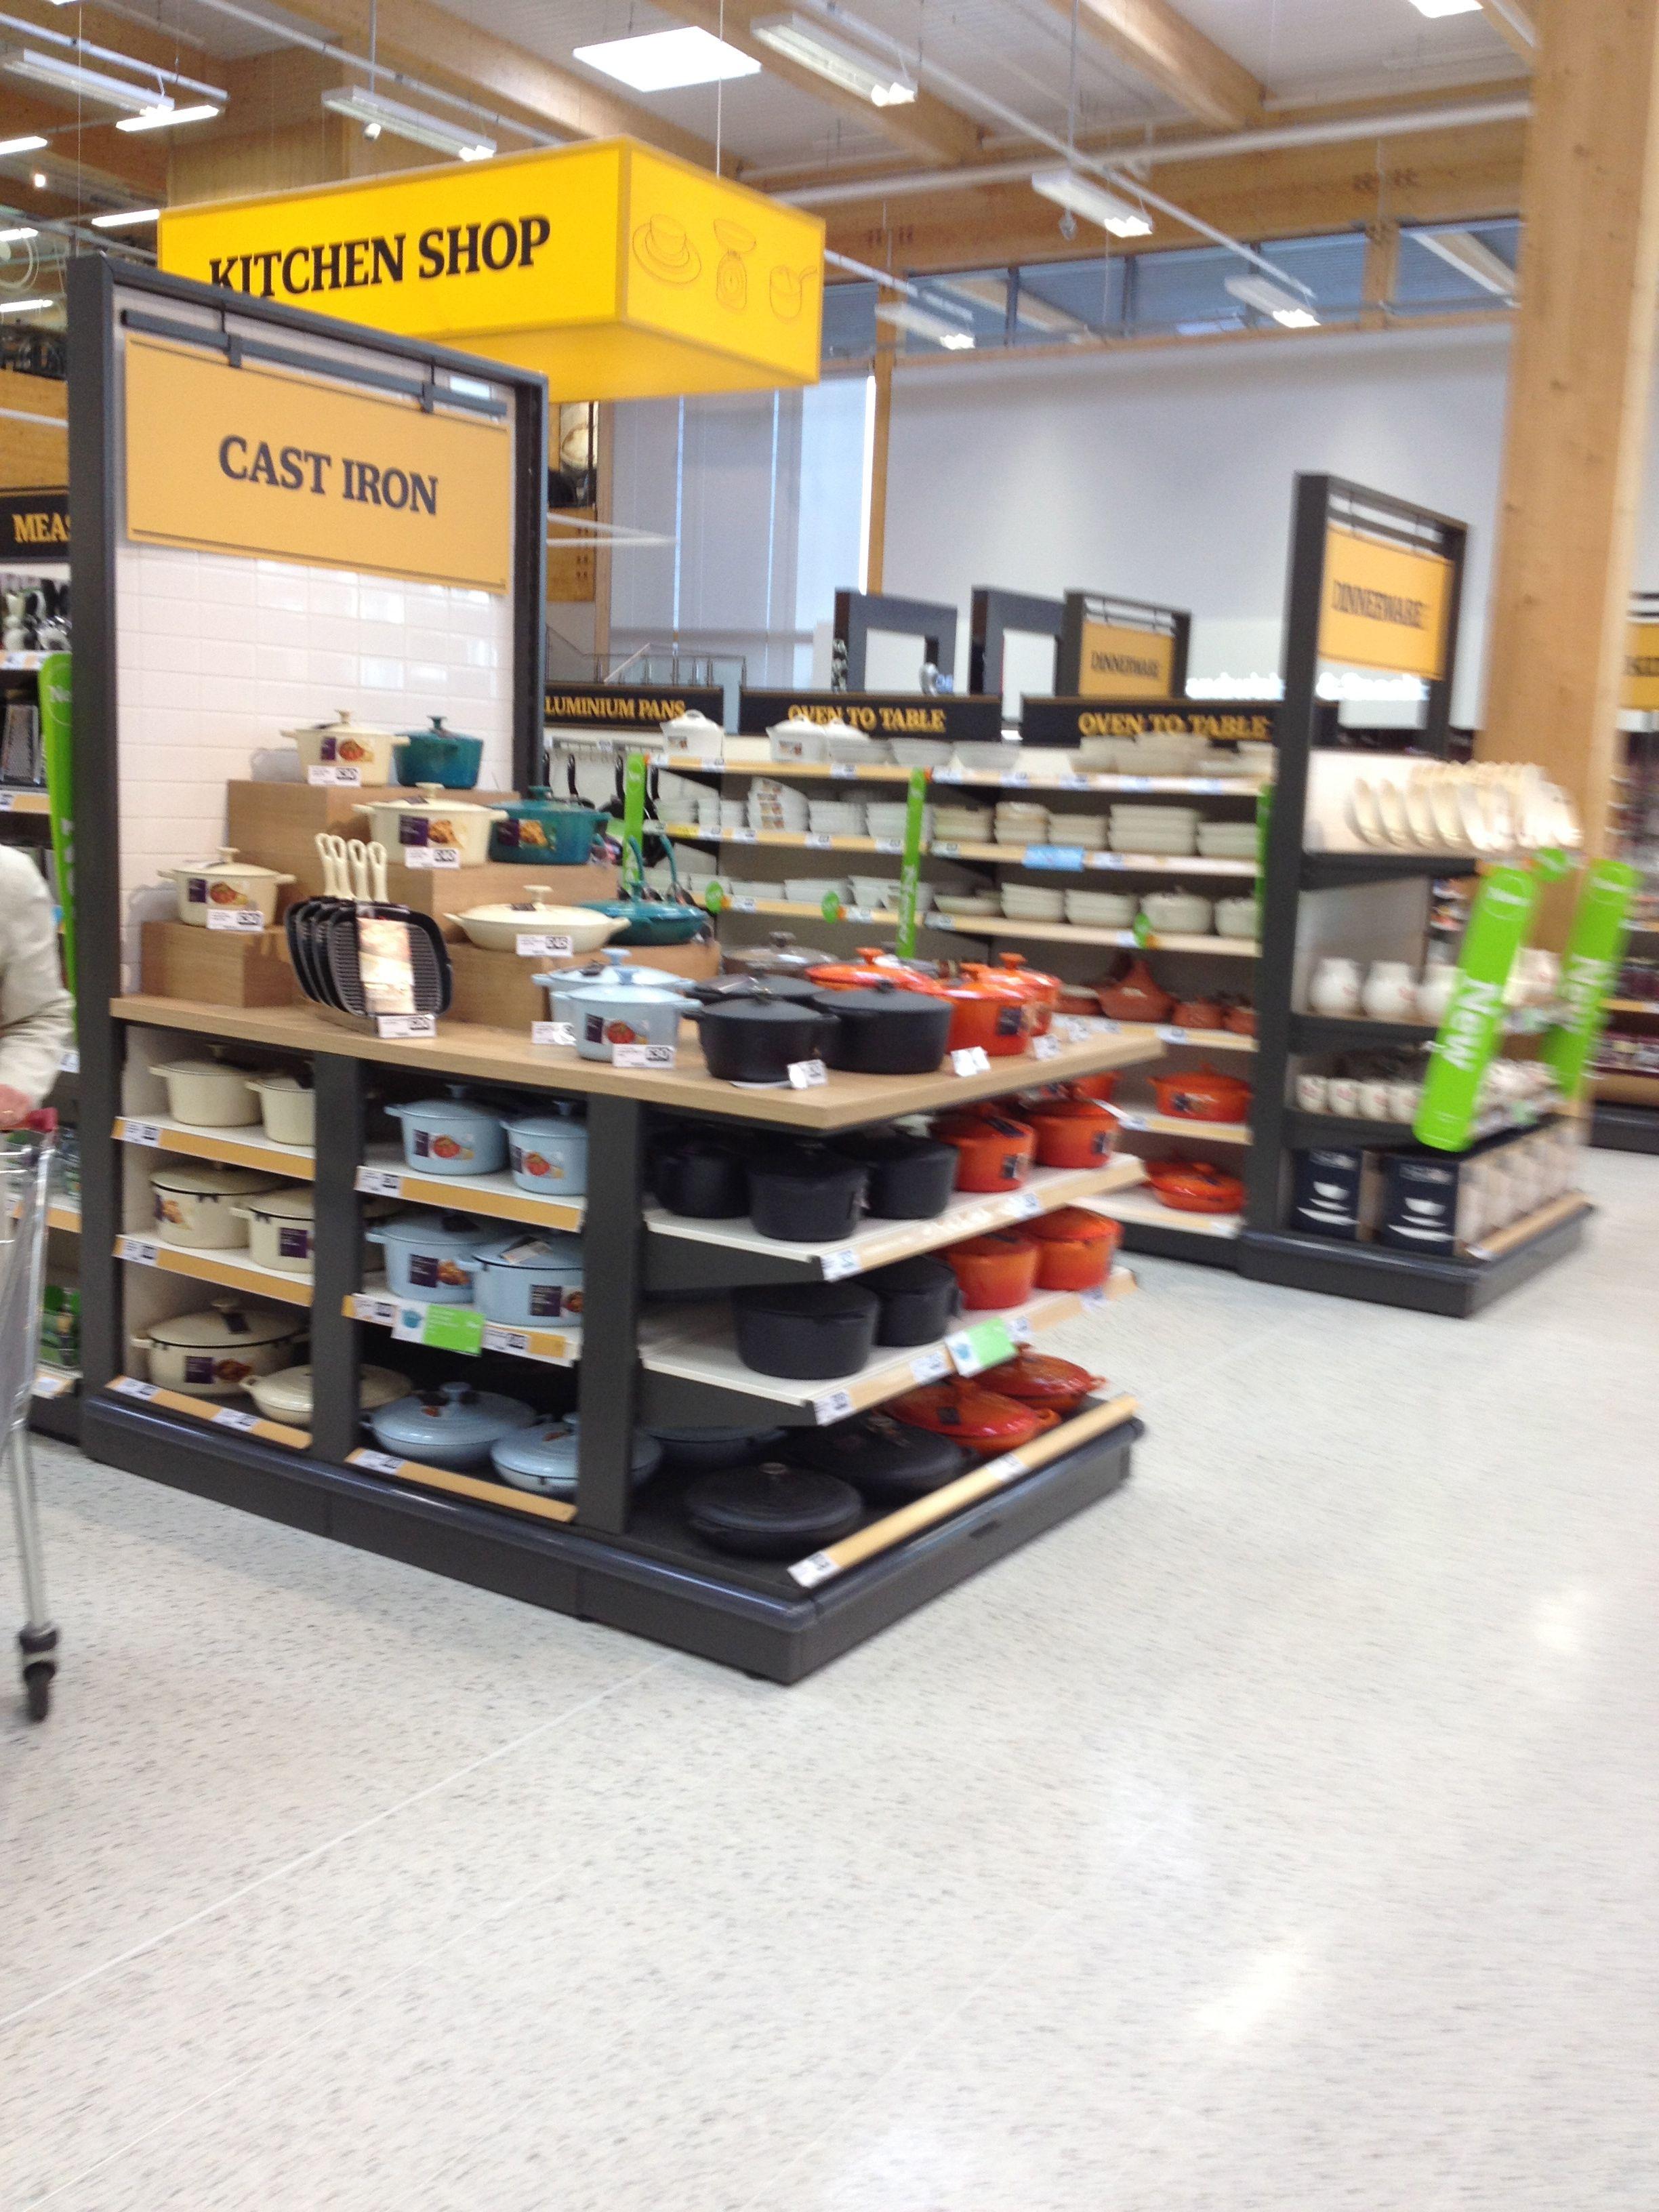 White apron sainsburys - Sainsbury S Kings Lynn Homewares Home Cook Dine Supermarket General